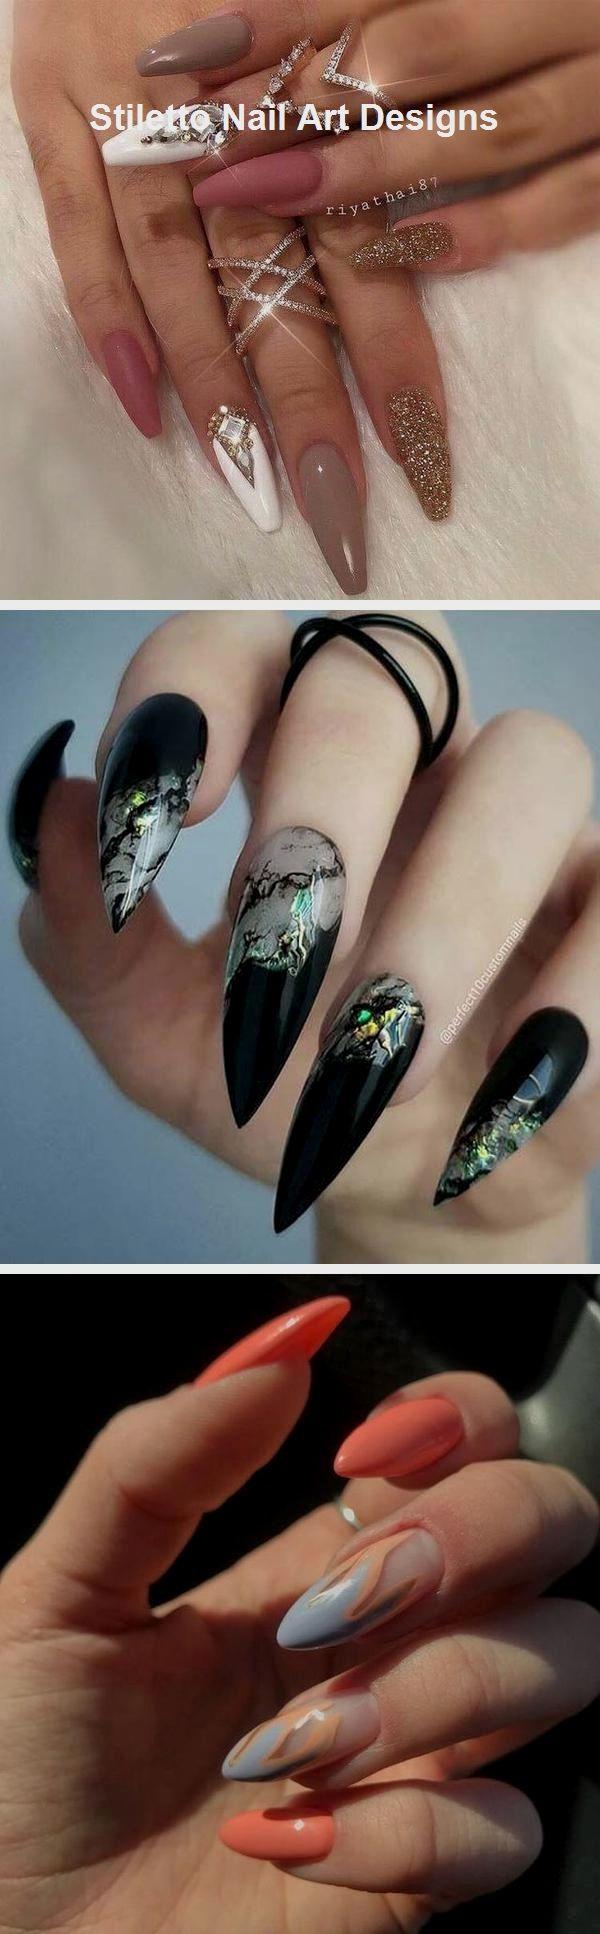 30 große Stiletto Nail Art Design-Ideen #naildesign #stilettonails – Nails